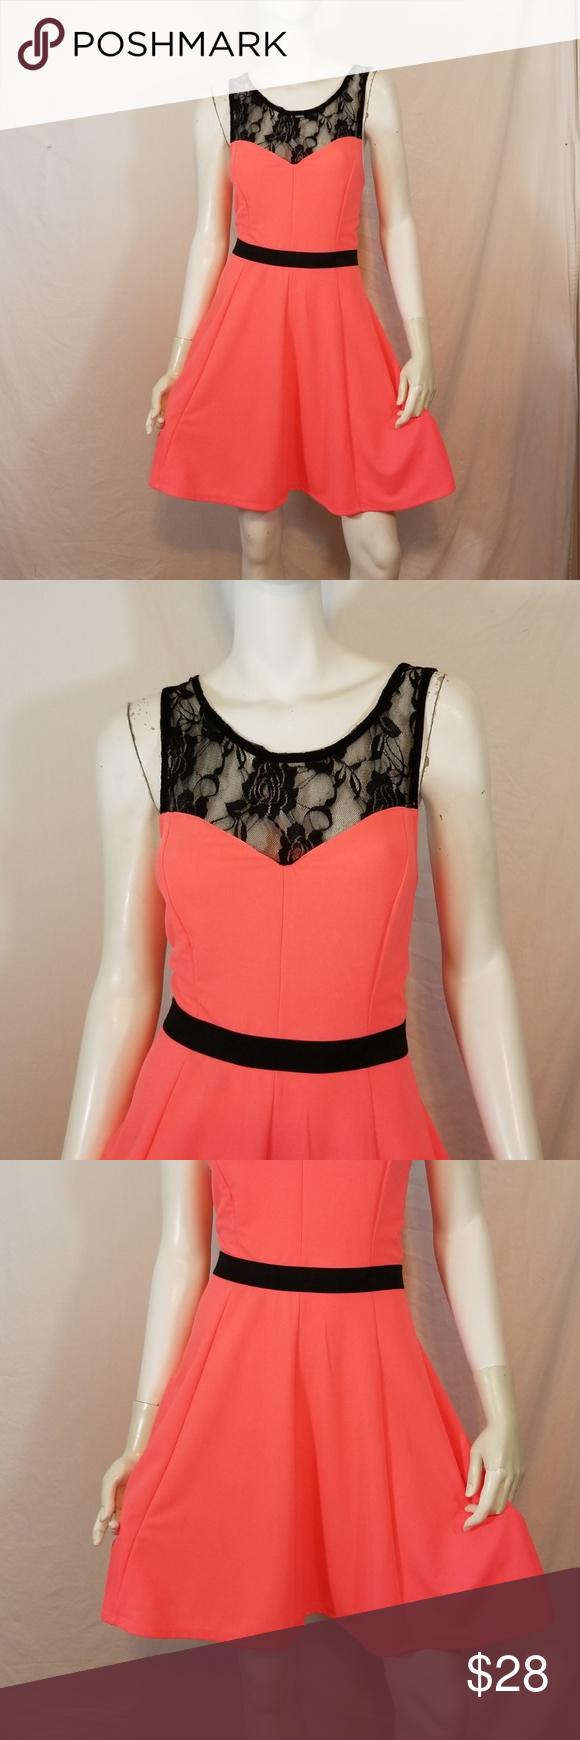 Hot pink and orange dress  Material Girl hot pink ebony lace flirty dress XL  My Posh Picks